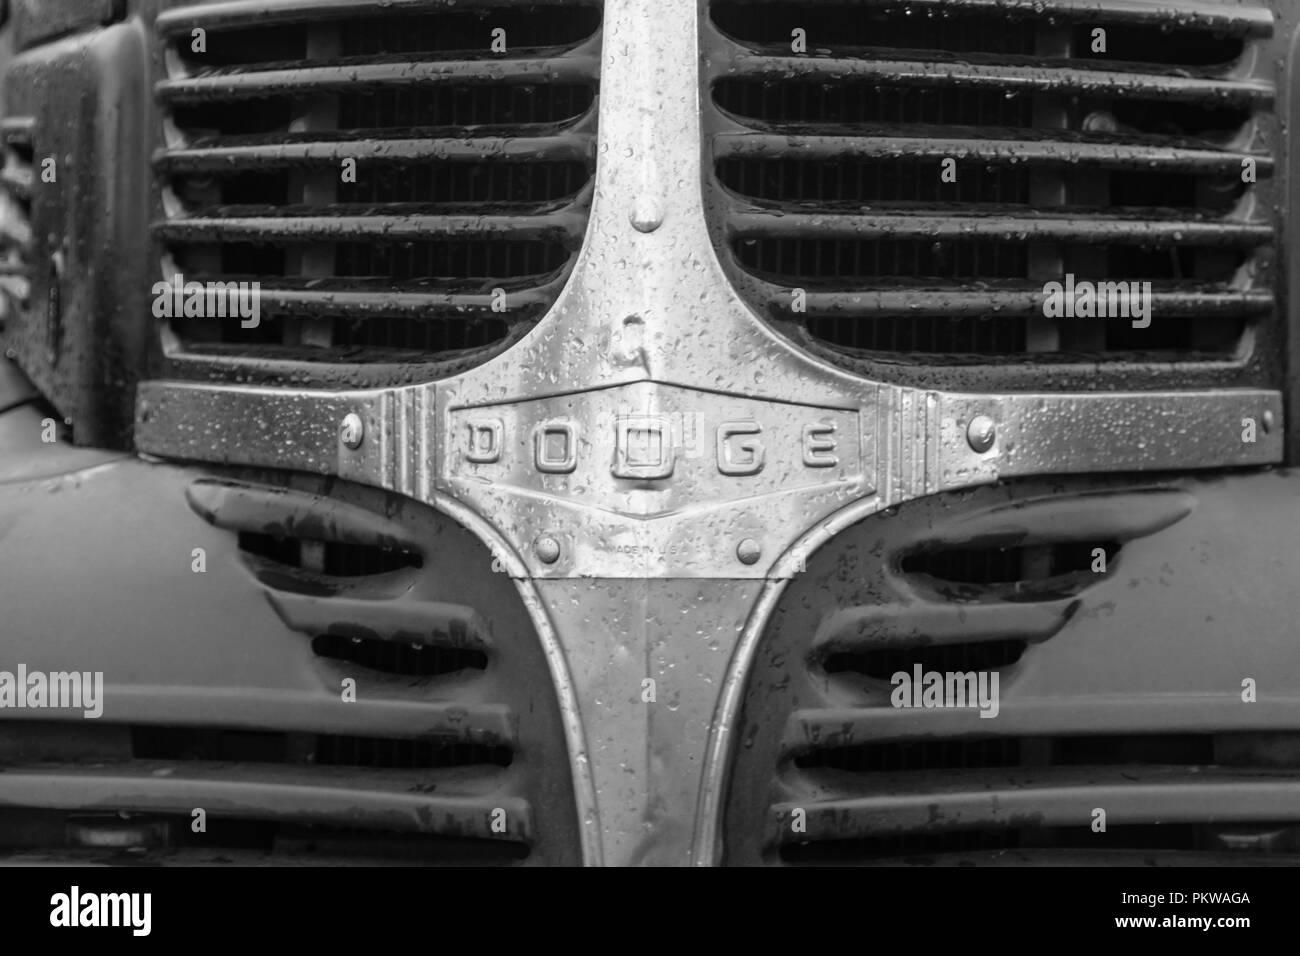 1946 Dodge WD-15 Pro Touring Rat Rod vintage pickup truck